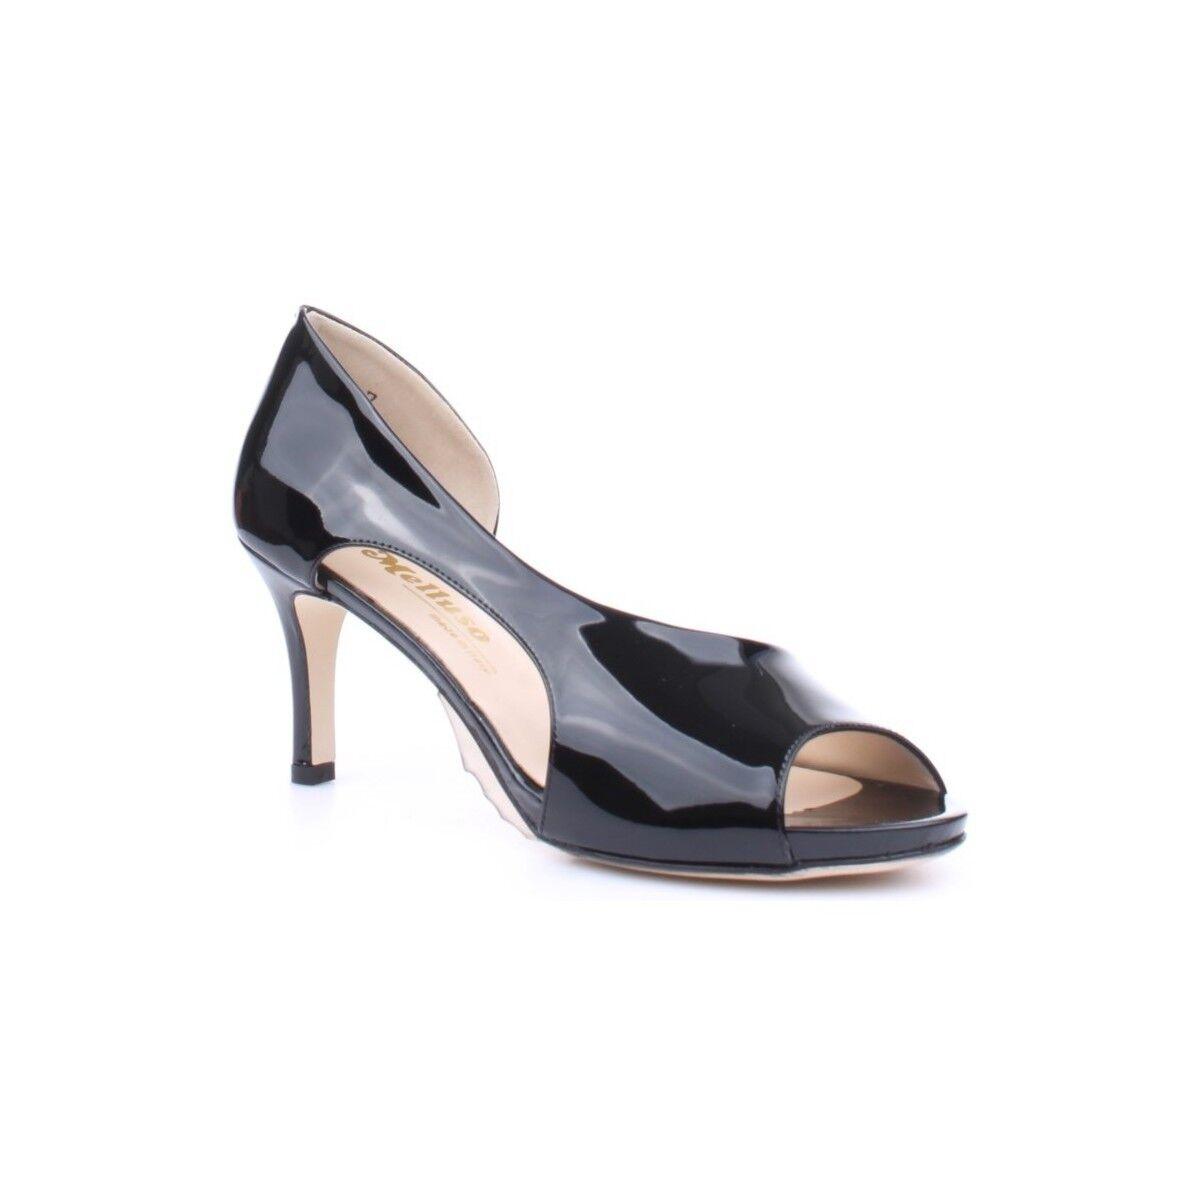 SCARPE DECOLTE' DECOLTE' DECOLTE' SANDALO DONNA MELLUSO ORIGINALE S815 PELLE scarpe P E 2017 NEW 6959d1